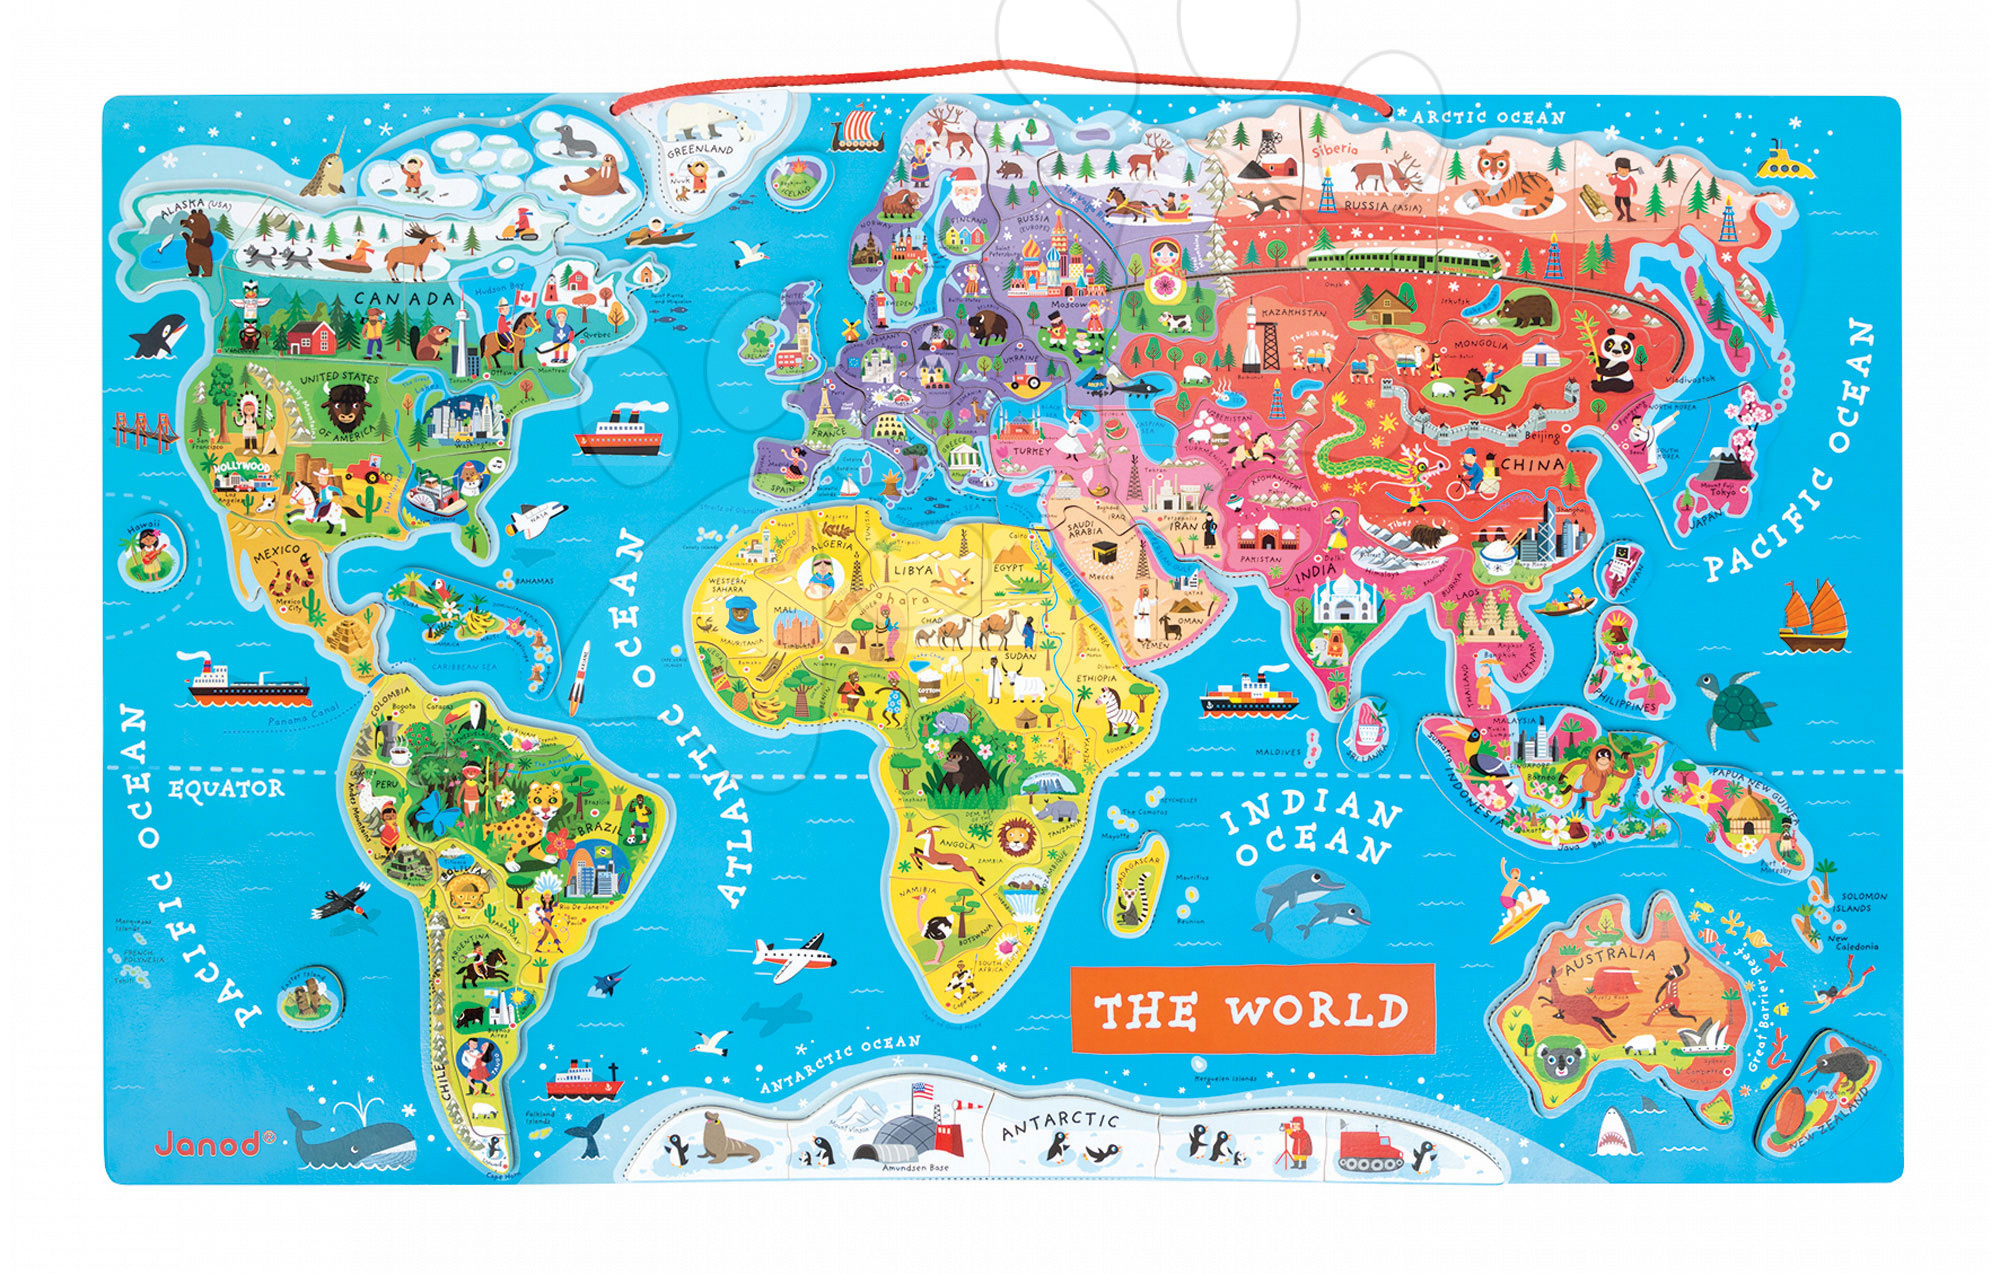 Magnetky pre deti - Magnetická mapa sveta Magnetic World Puzzle English Version Janod 92 magnetov od 5 rokov